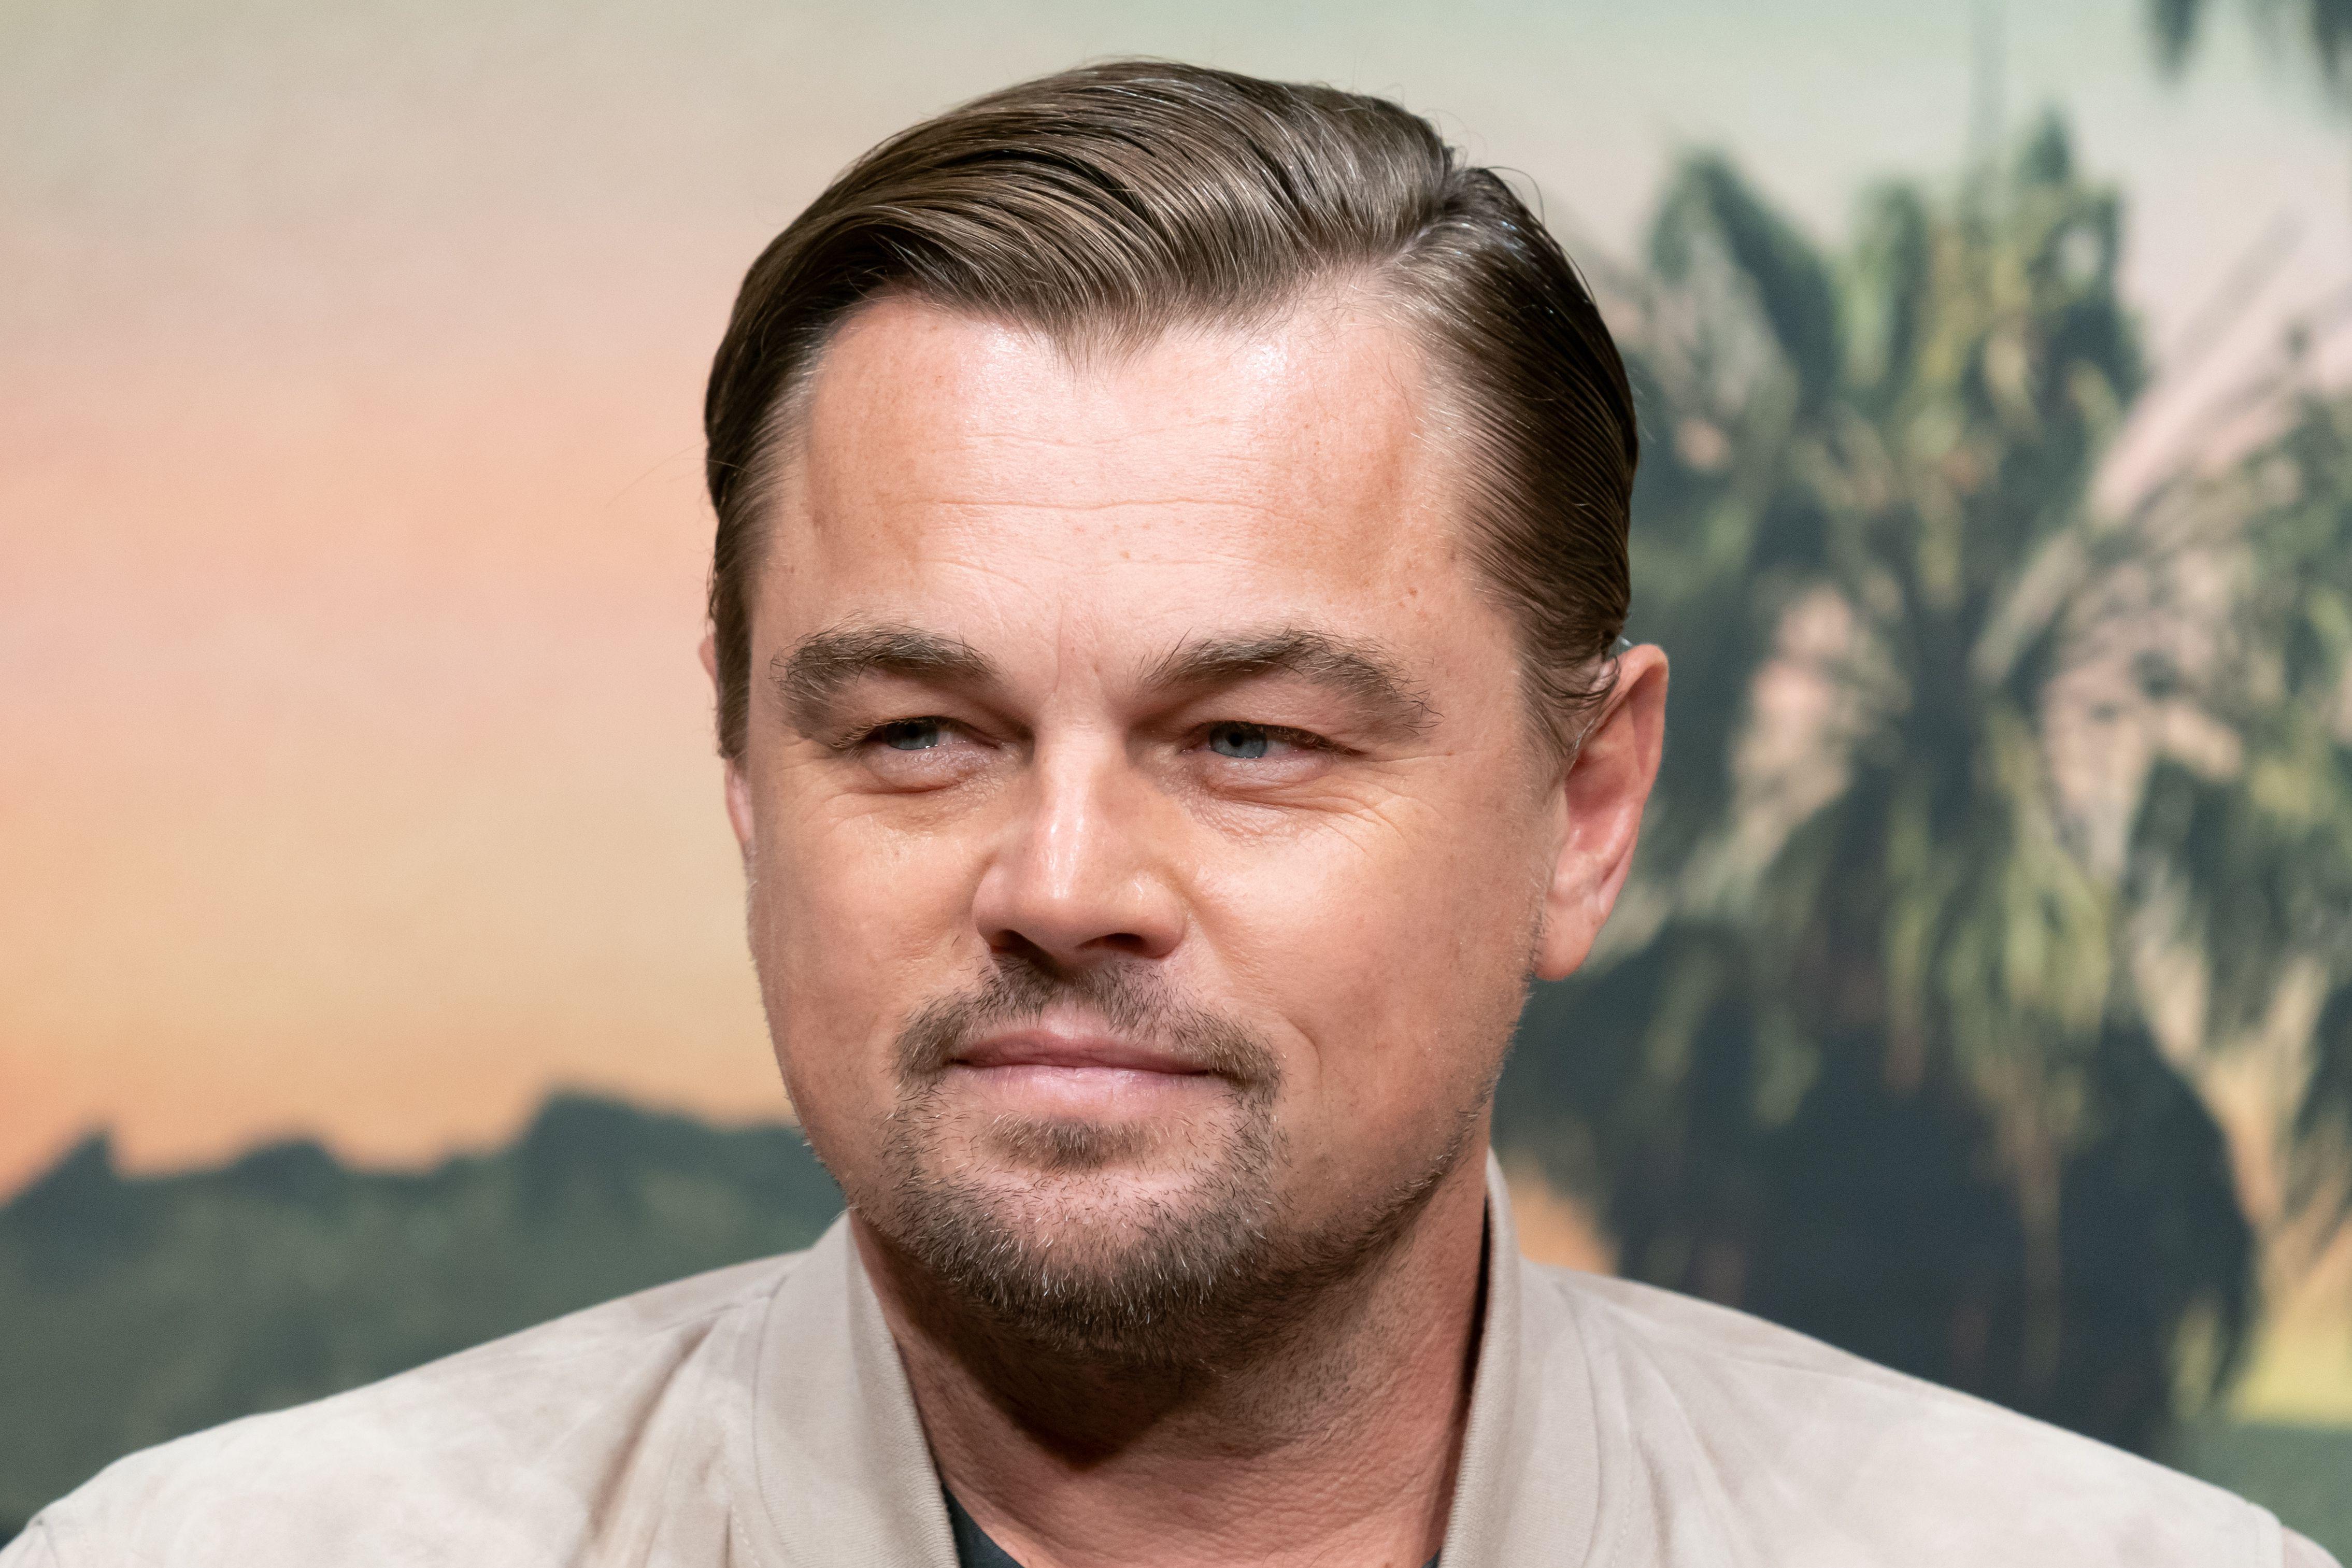 Brazil President Blames Leonardo DiCaprio for Funding Amazon Wildfires